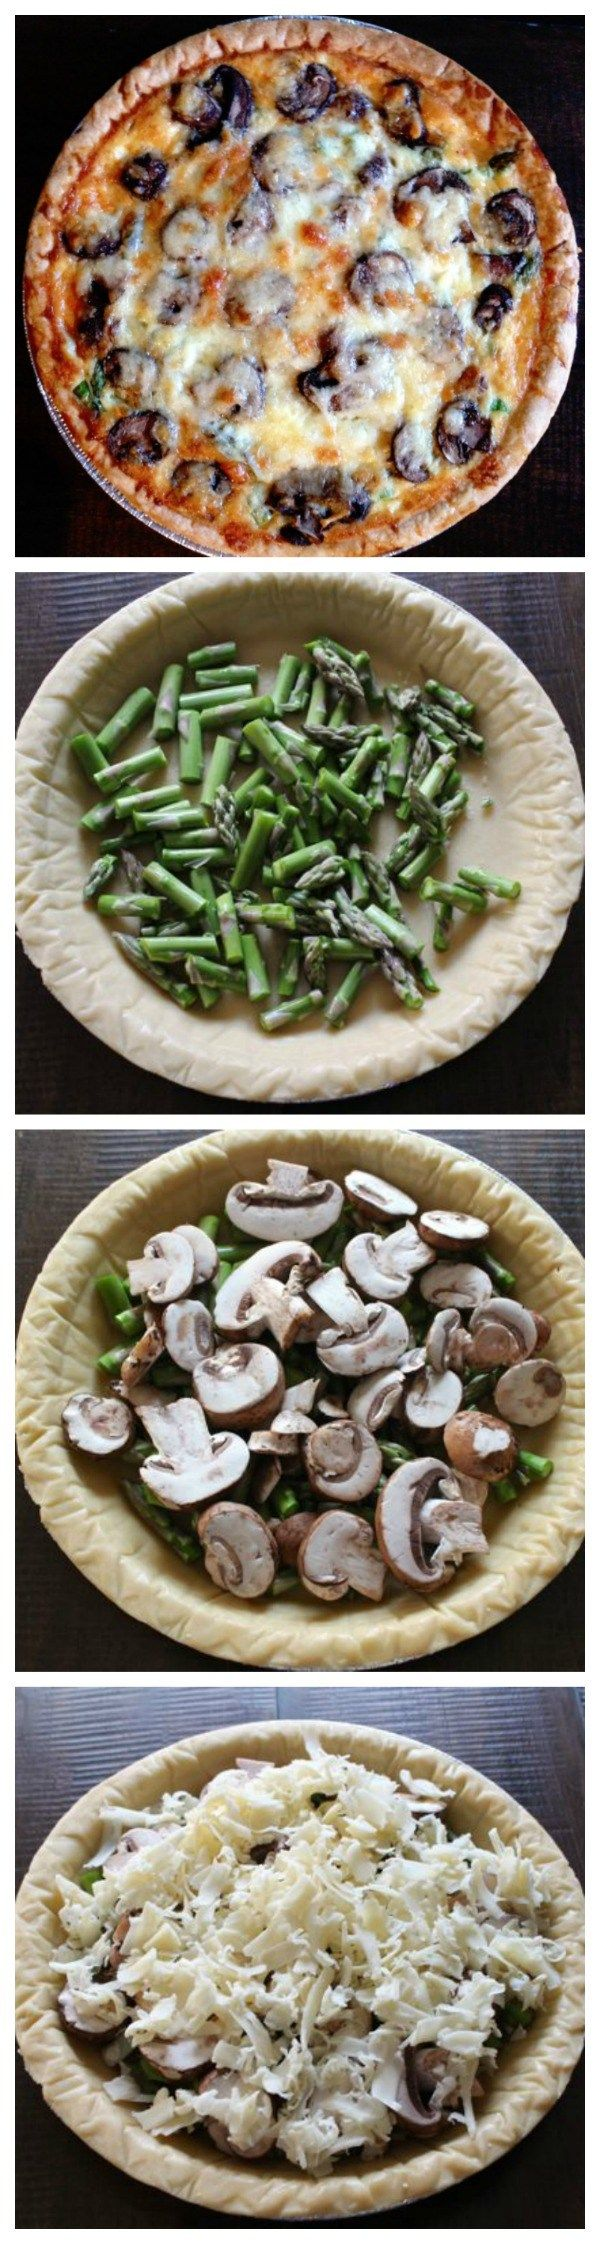 Easy quiche recipe for brunch